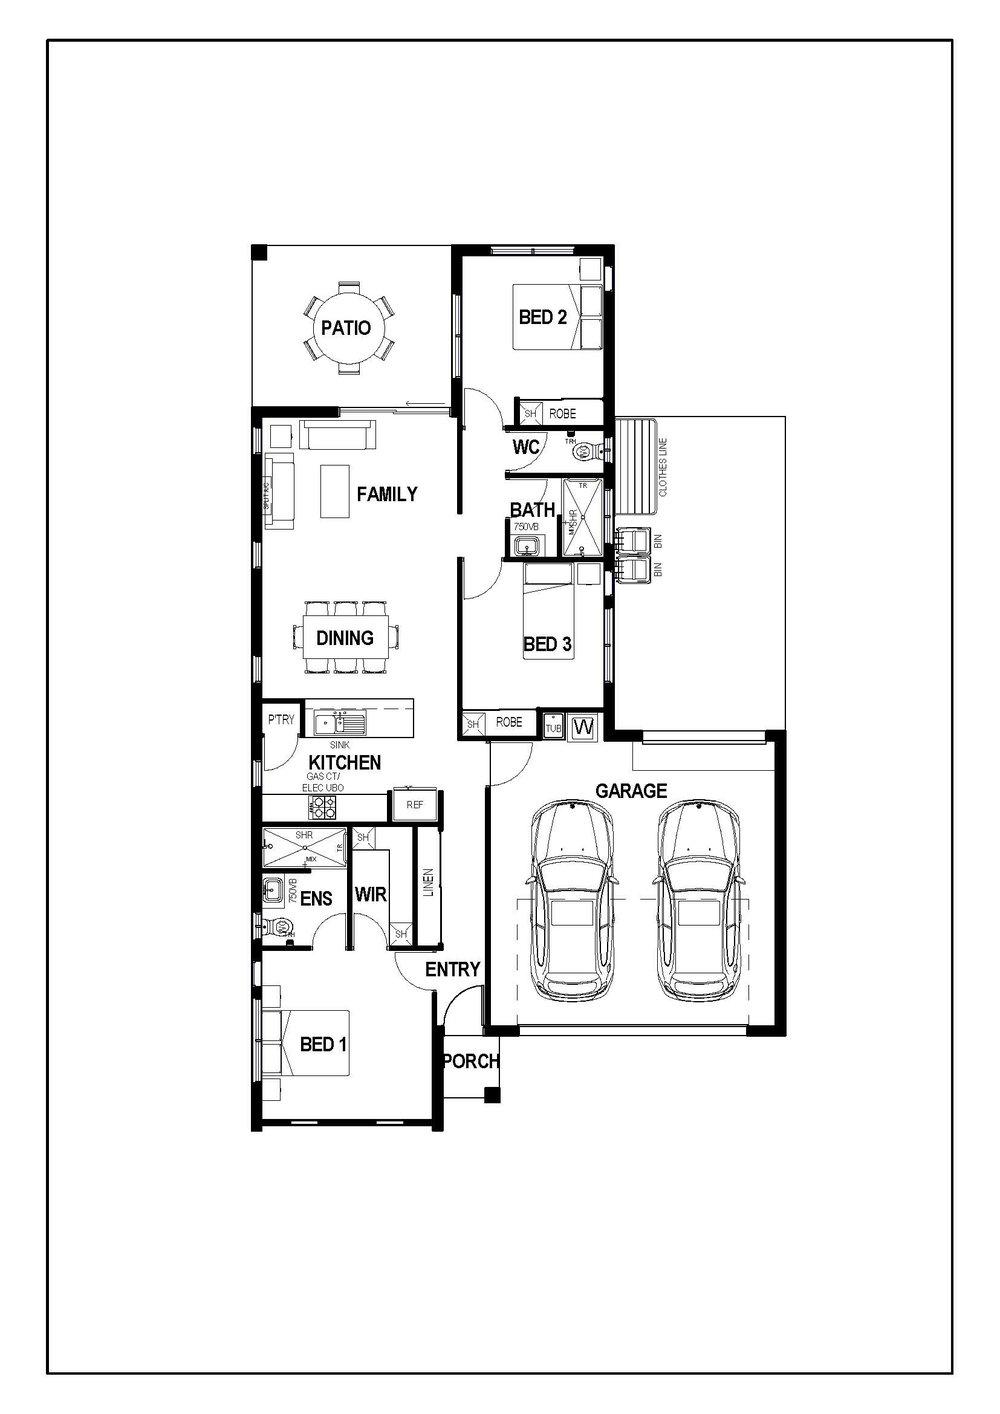 Carramar B Dble Garage Floor plan.jpg